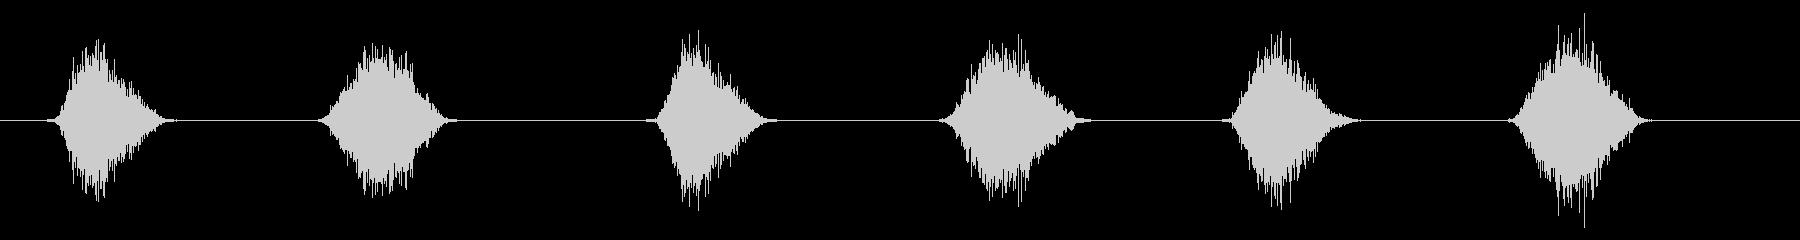 PC マウス ムーブ03-11(ソフト)の未再生の波形